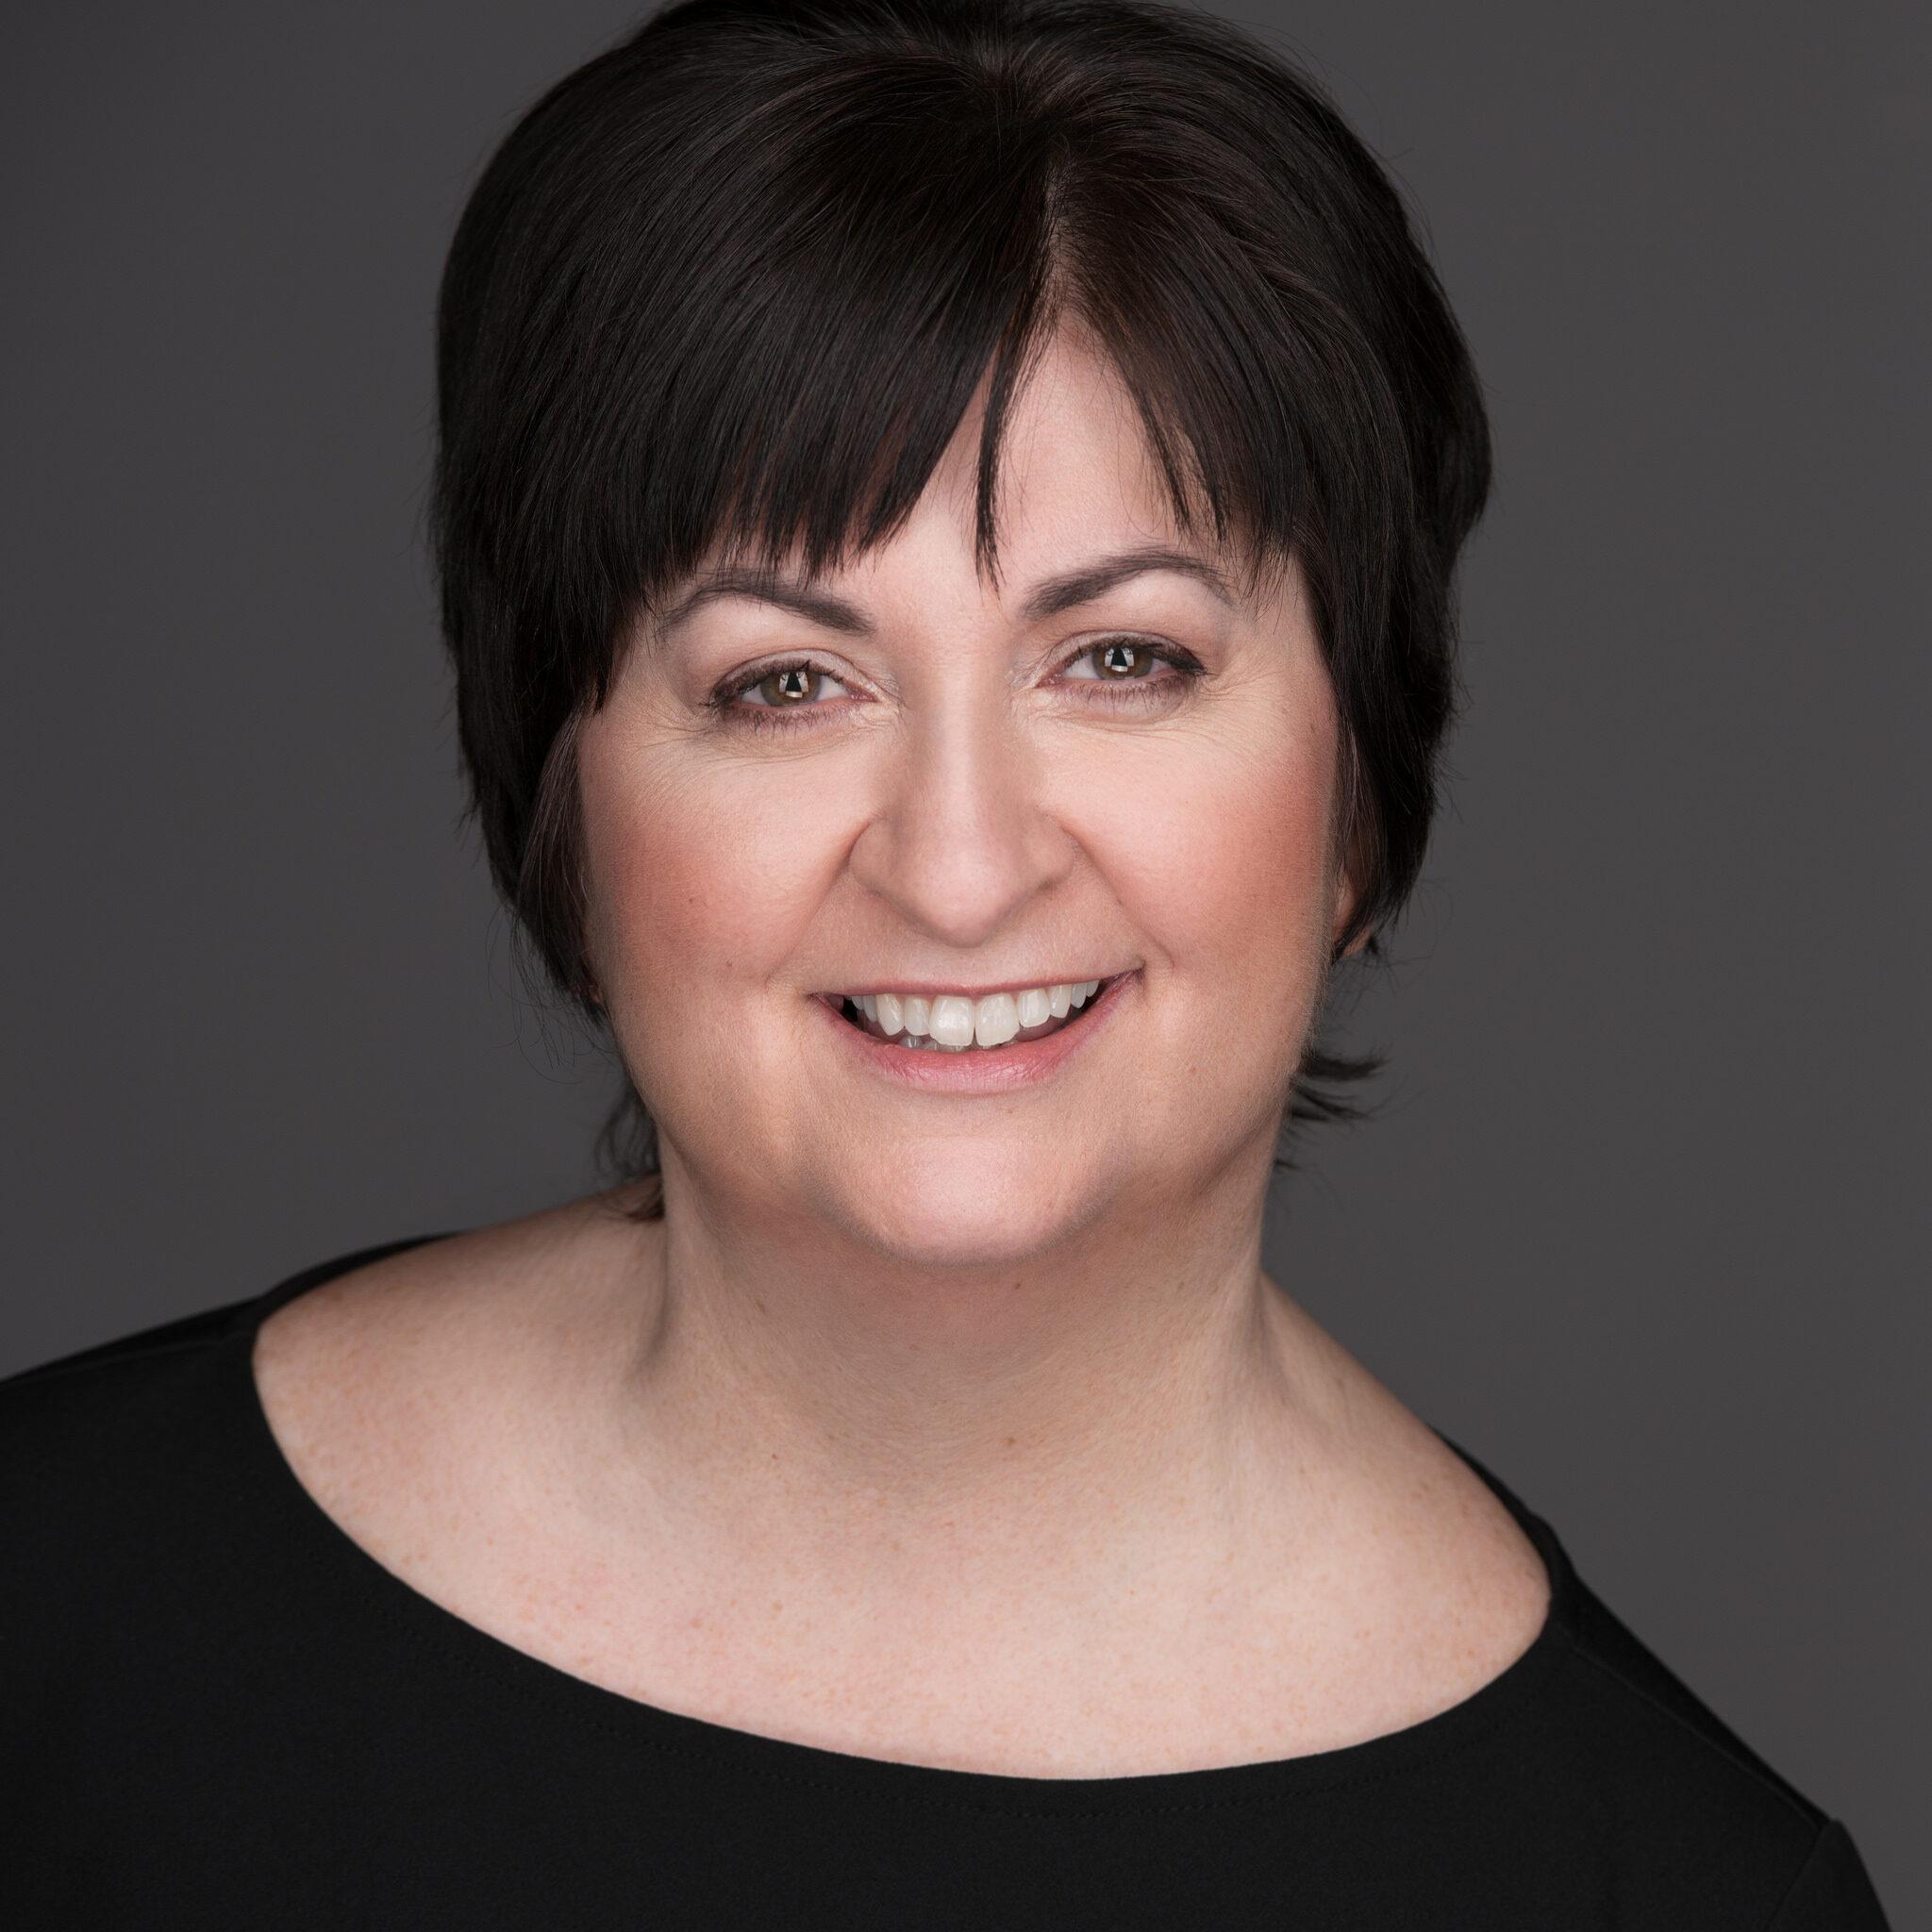 Diane Weller Coaching